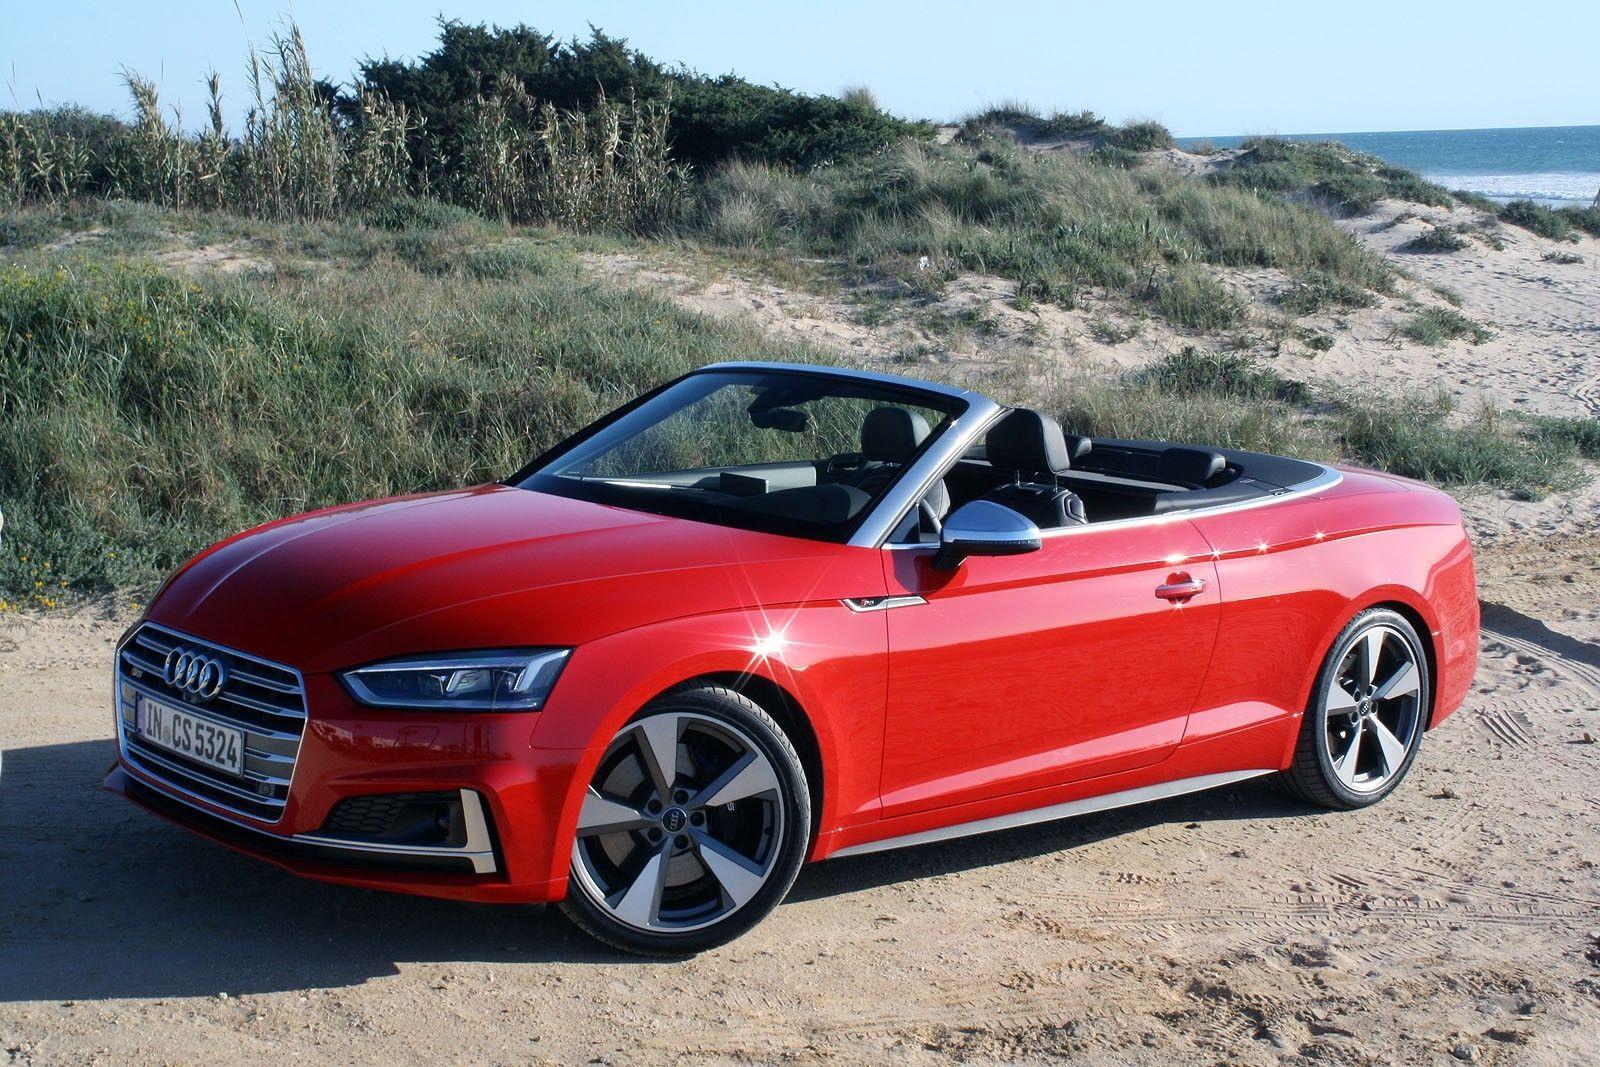 2018 Audi A5 Cabriolet First Drive Audi A5 A5 Cabriolet Audi S5